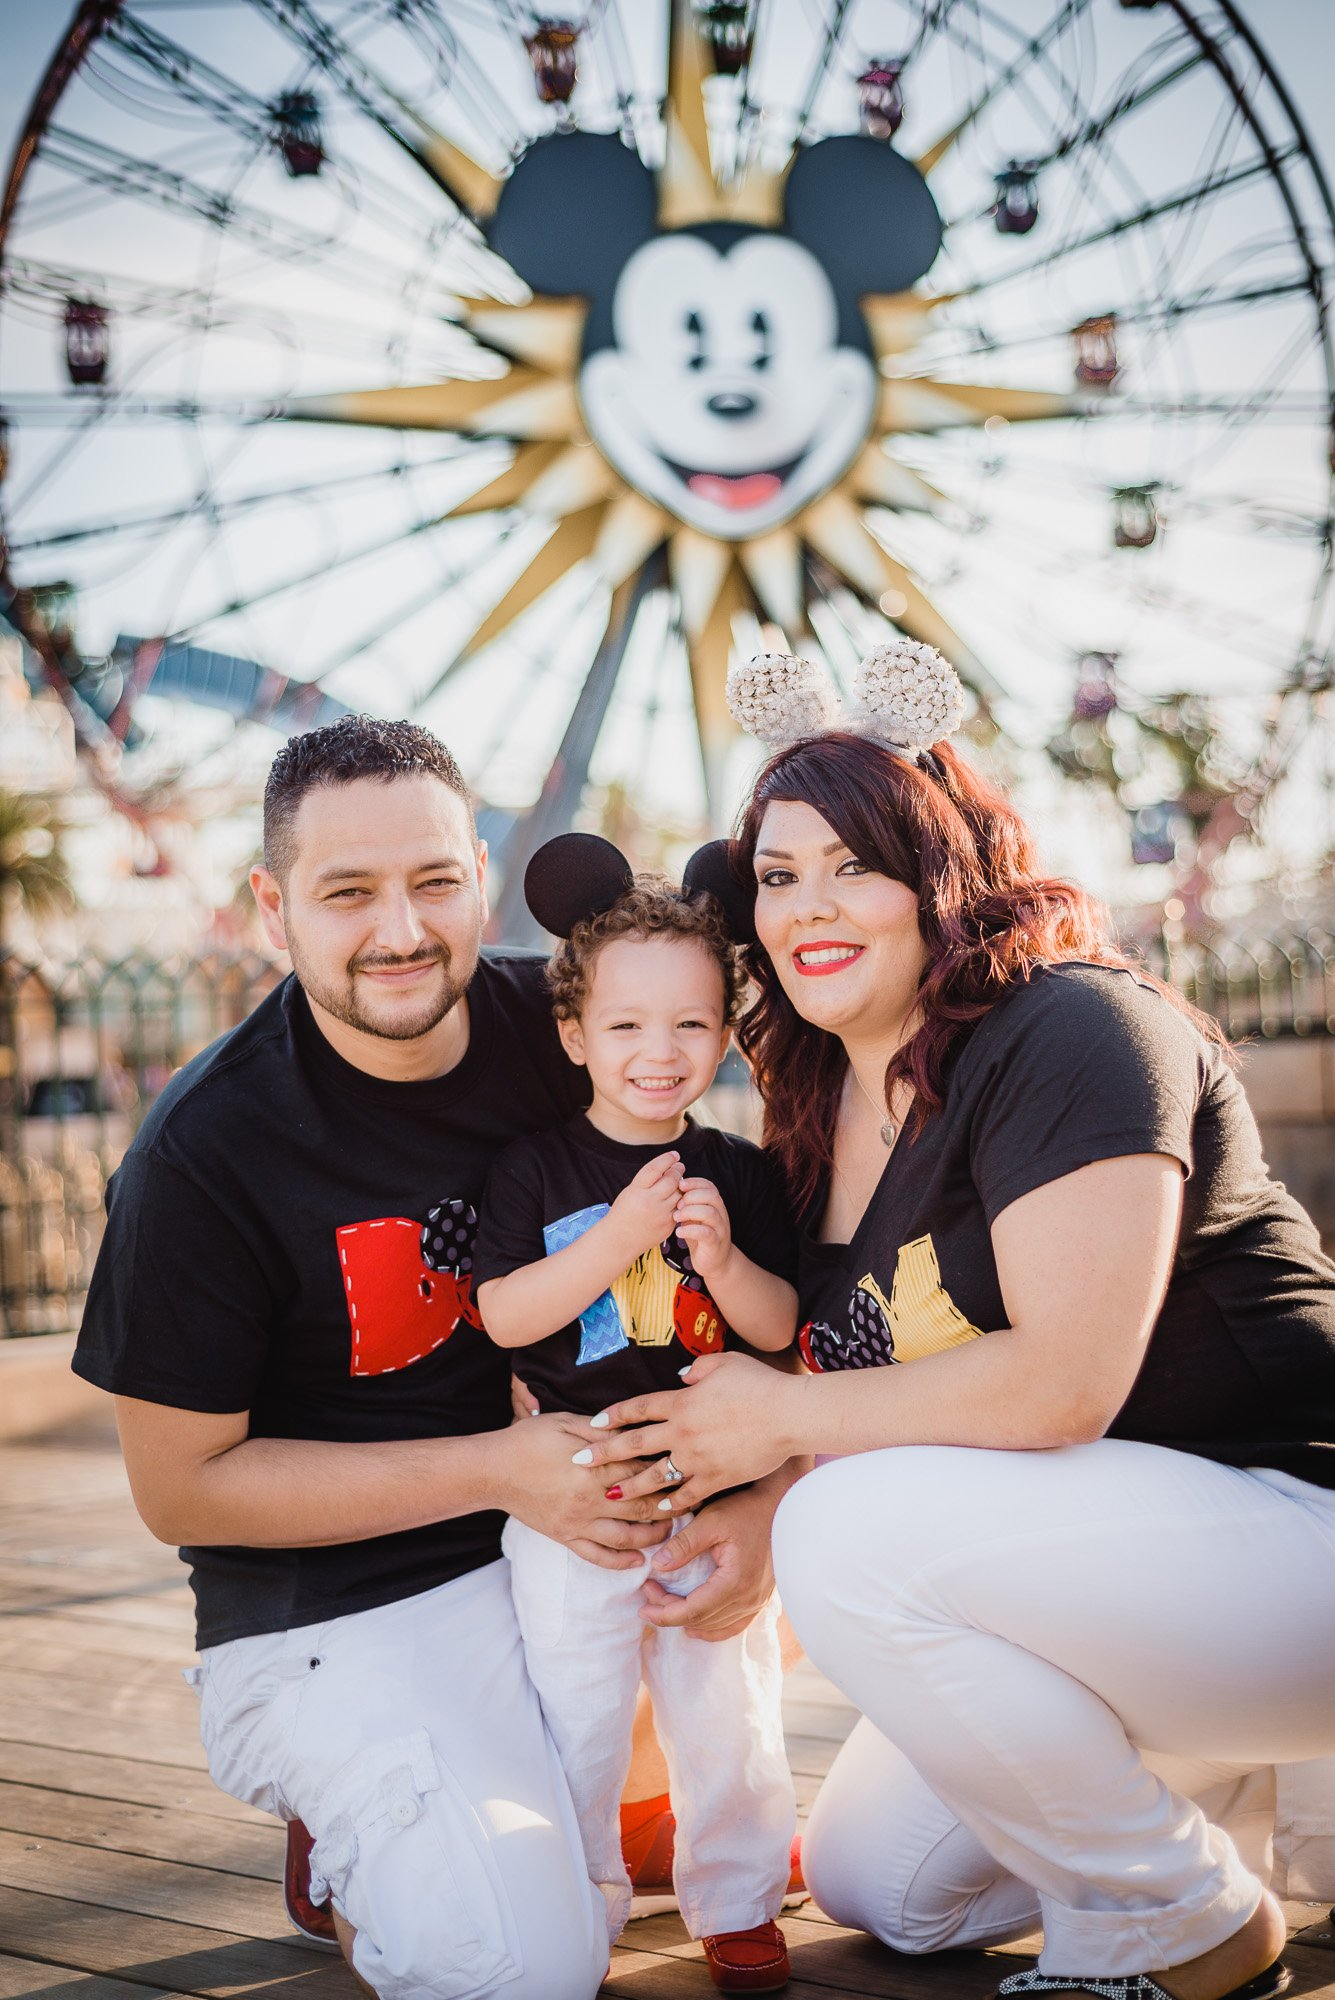 Diaz family posing by a ferris wheel